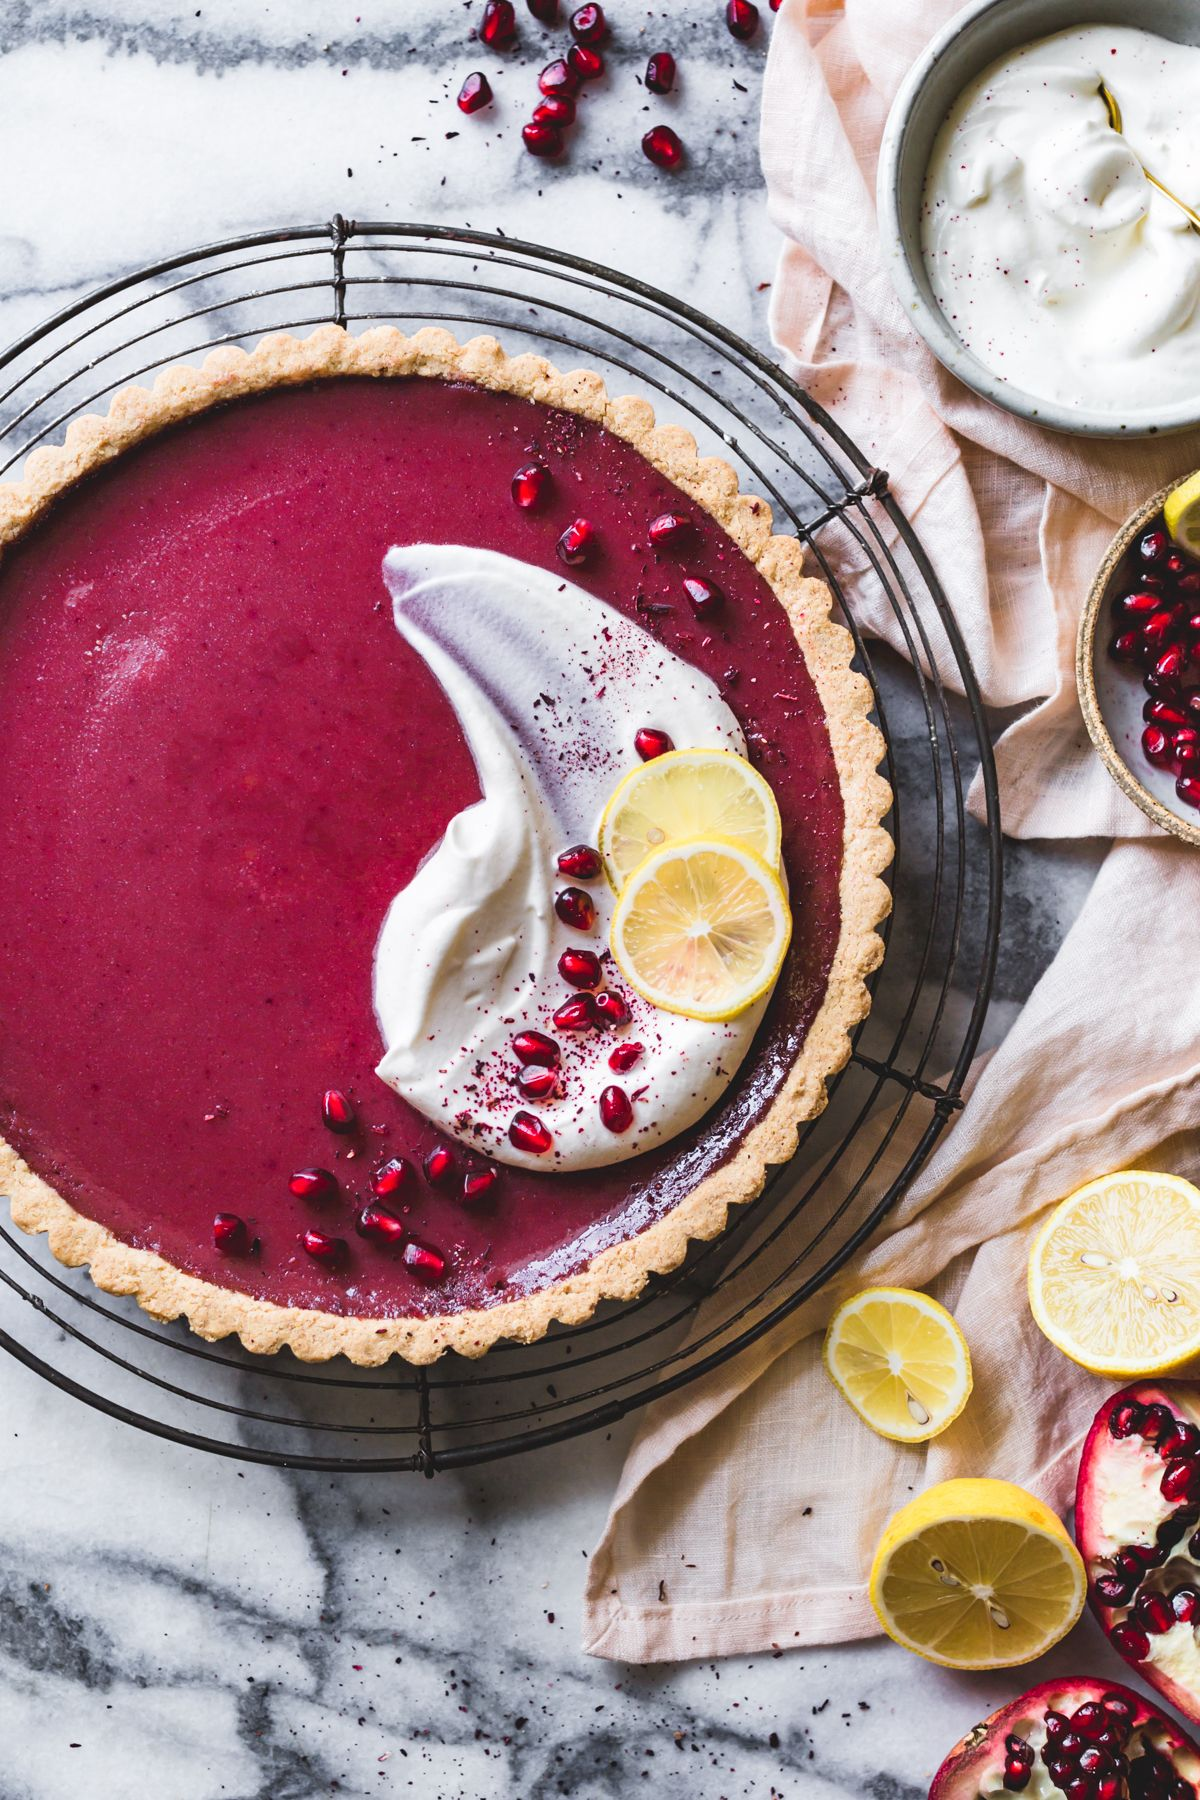 Pomegranate Tart With Hibiscus Lemon And Almond Flour Crust